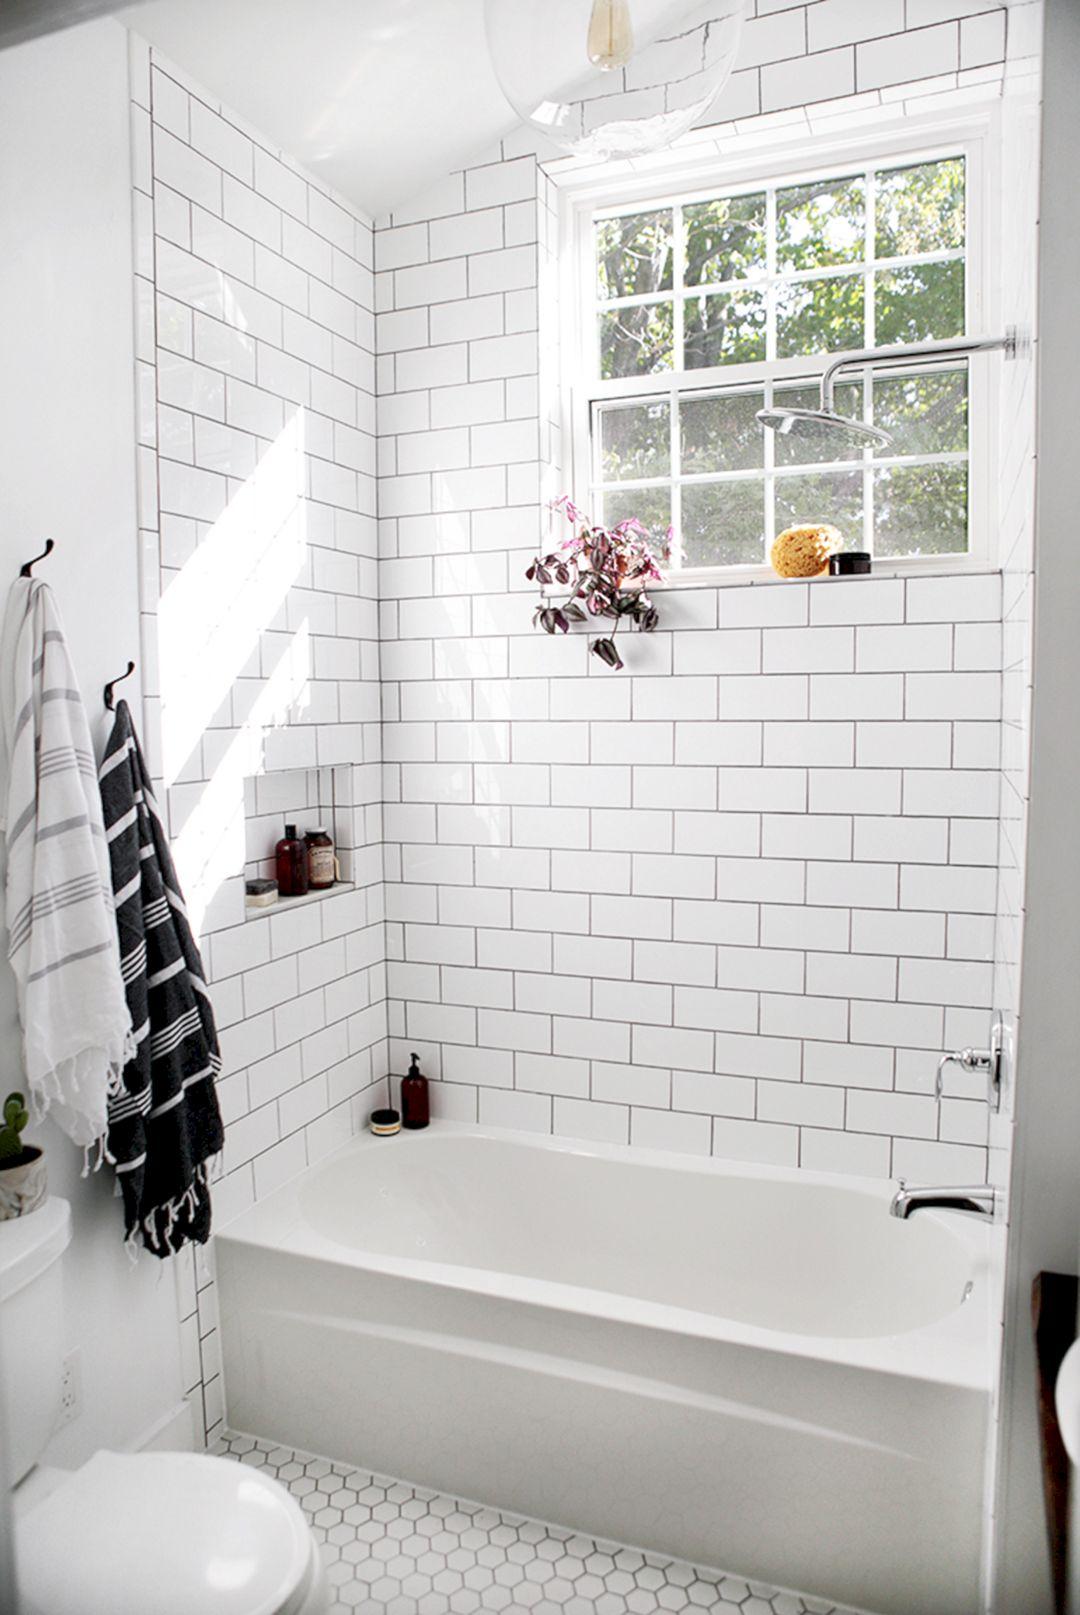 Traditional Bathroom Tile Ideas (Traditional Bathroom Tile ... on Bathroom Tile Designs  id=17844